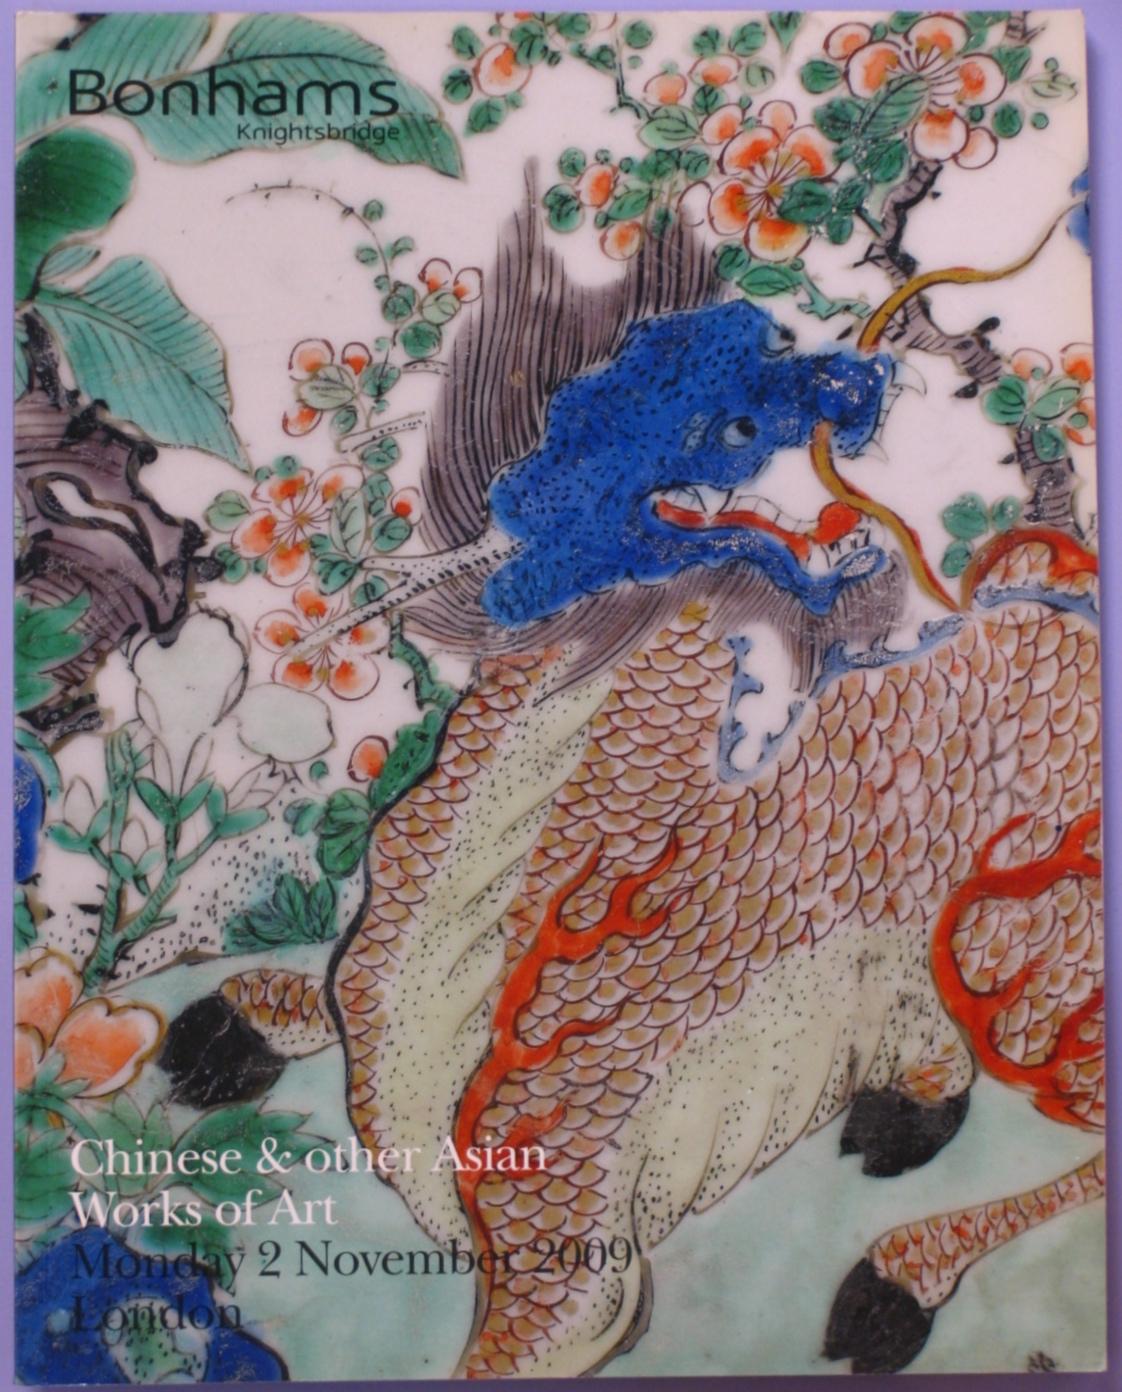 BK20091102: Bookshop: [2009] Bonhams Knightsbridge Chinese & other Asian Works of Art